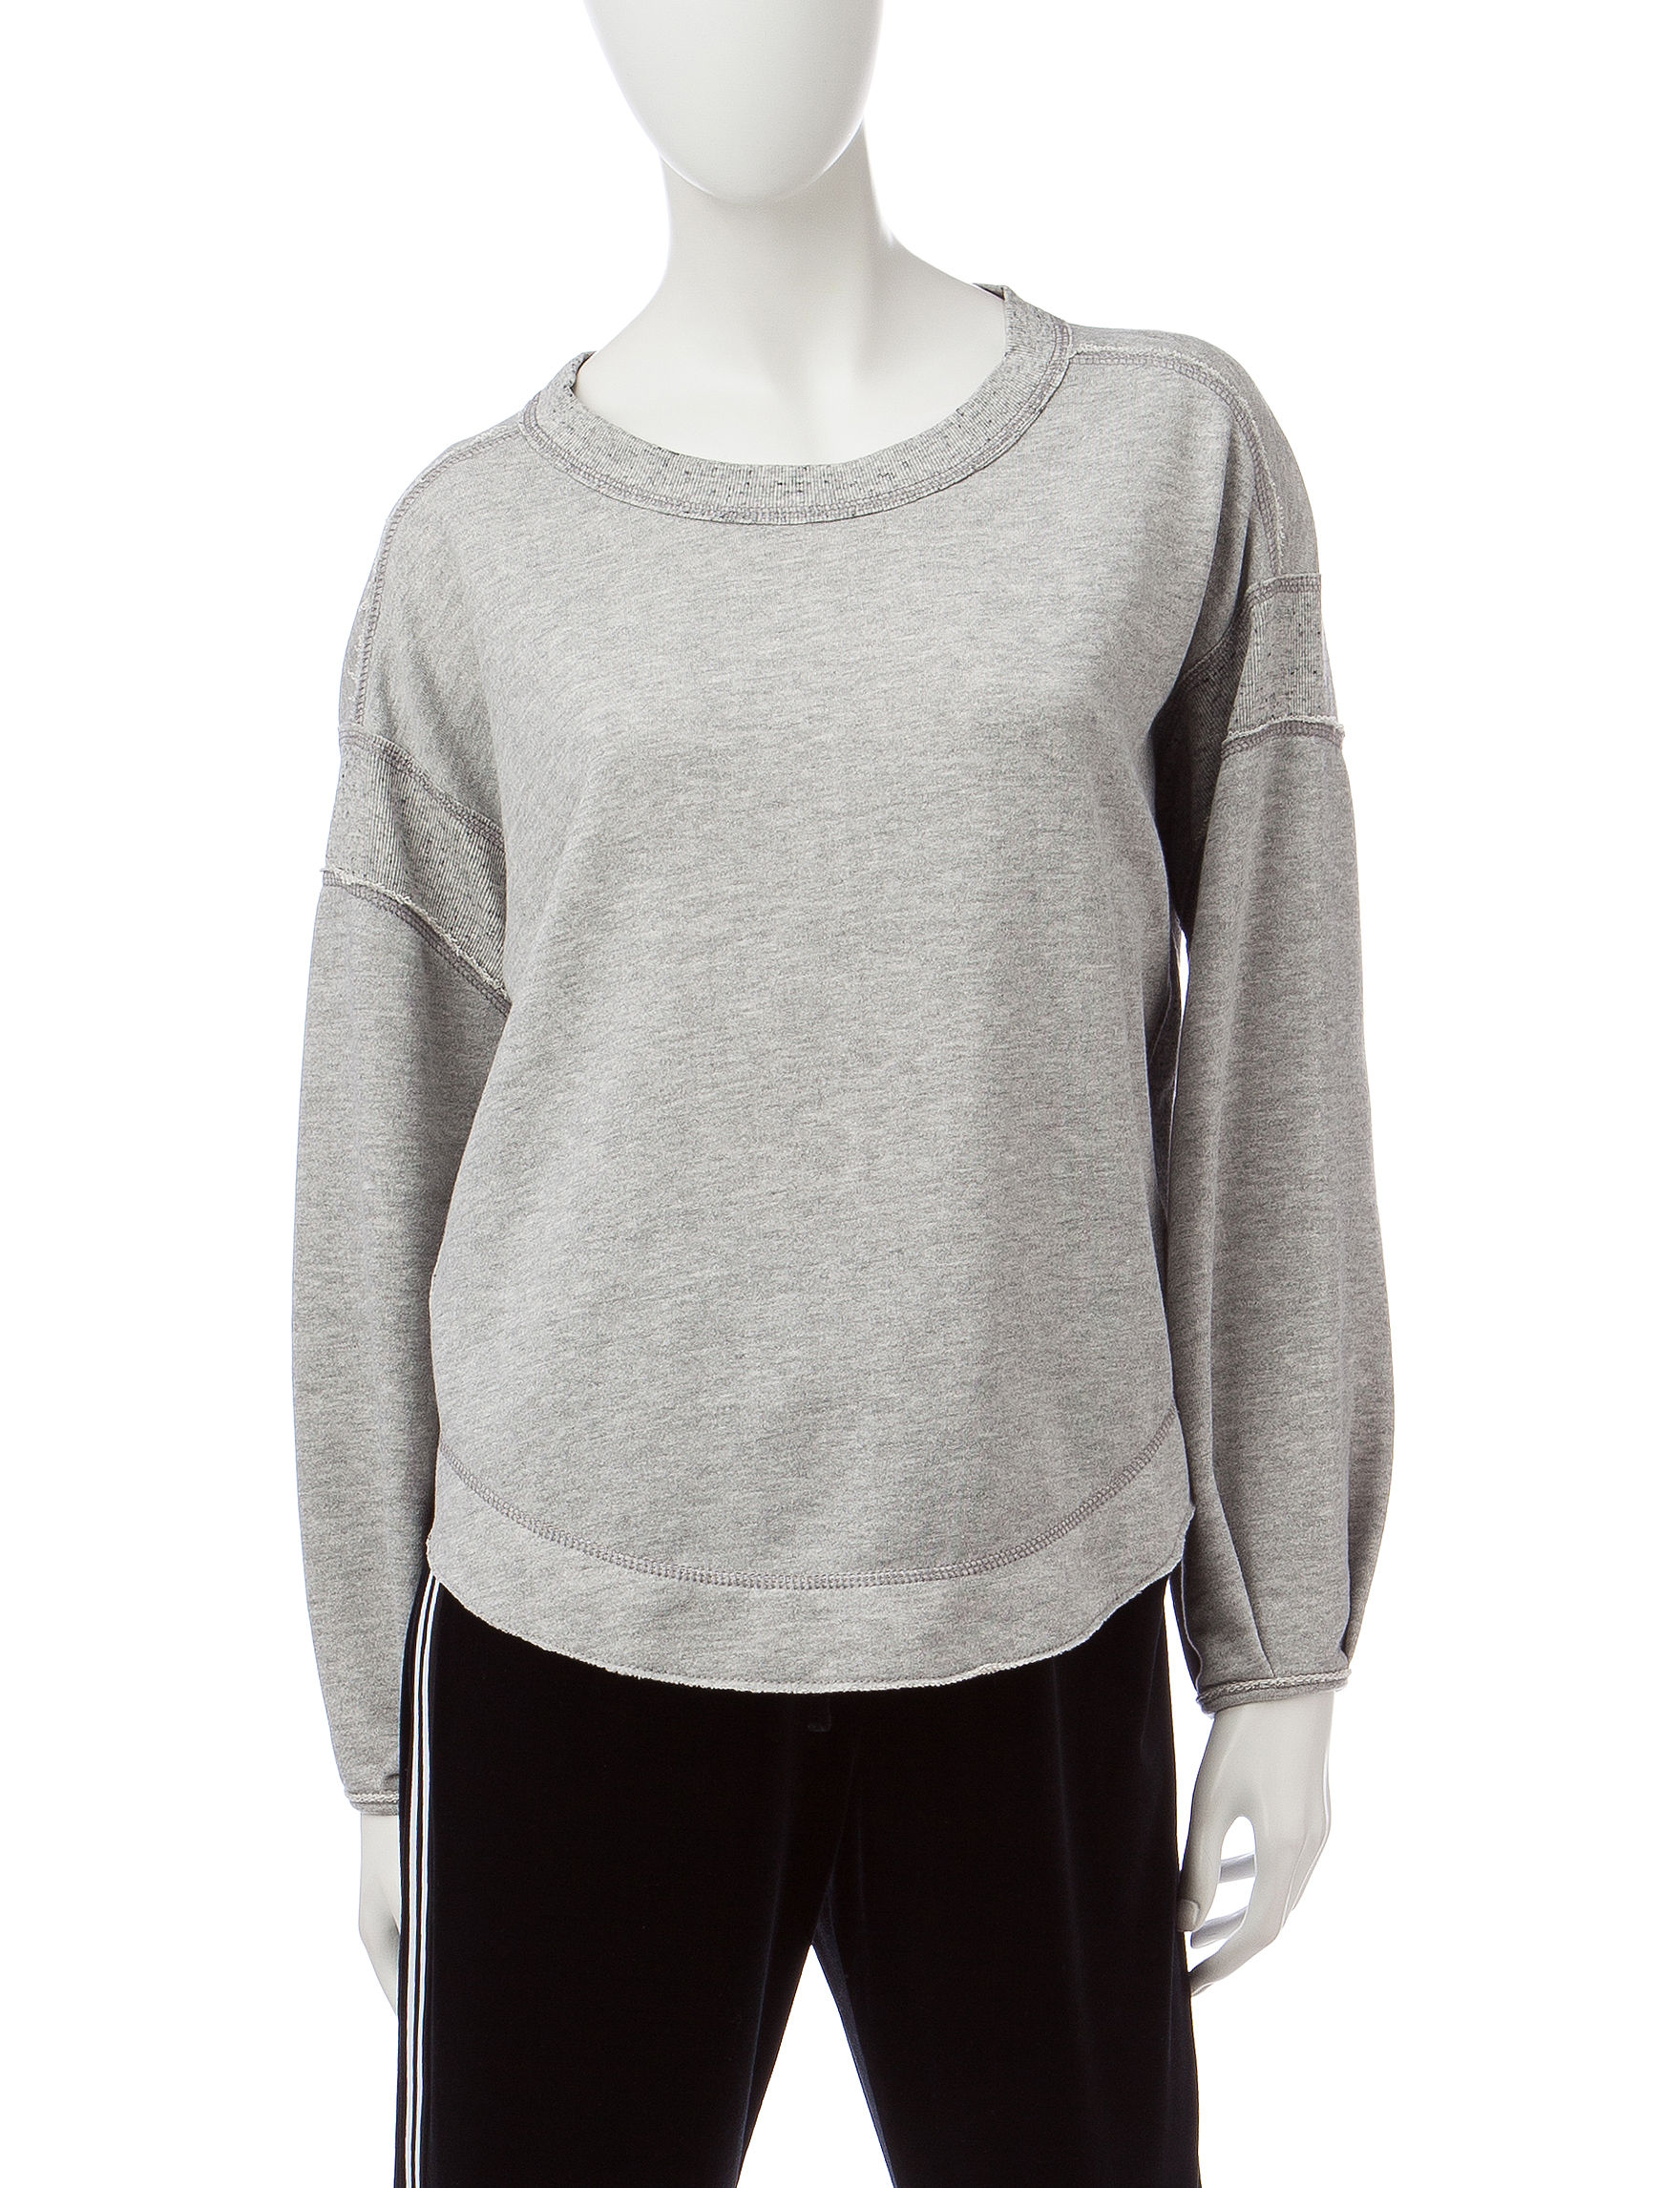 Signature Studio Heather Grey Shirts & Blouses